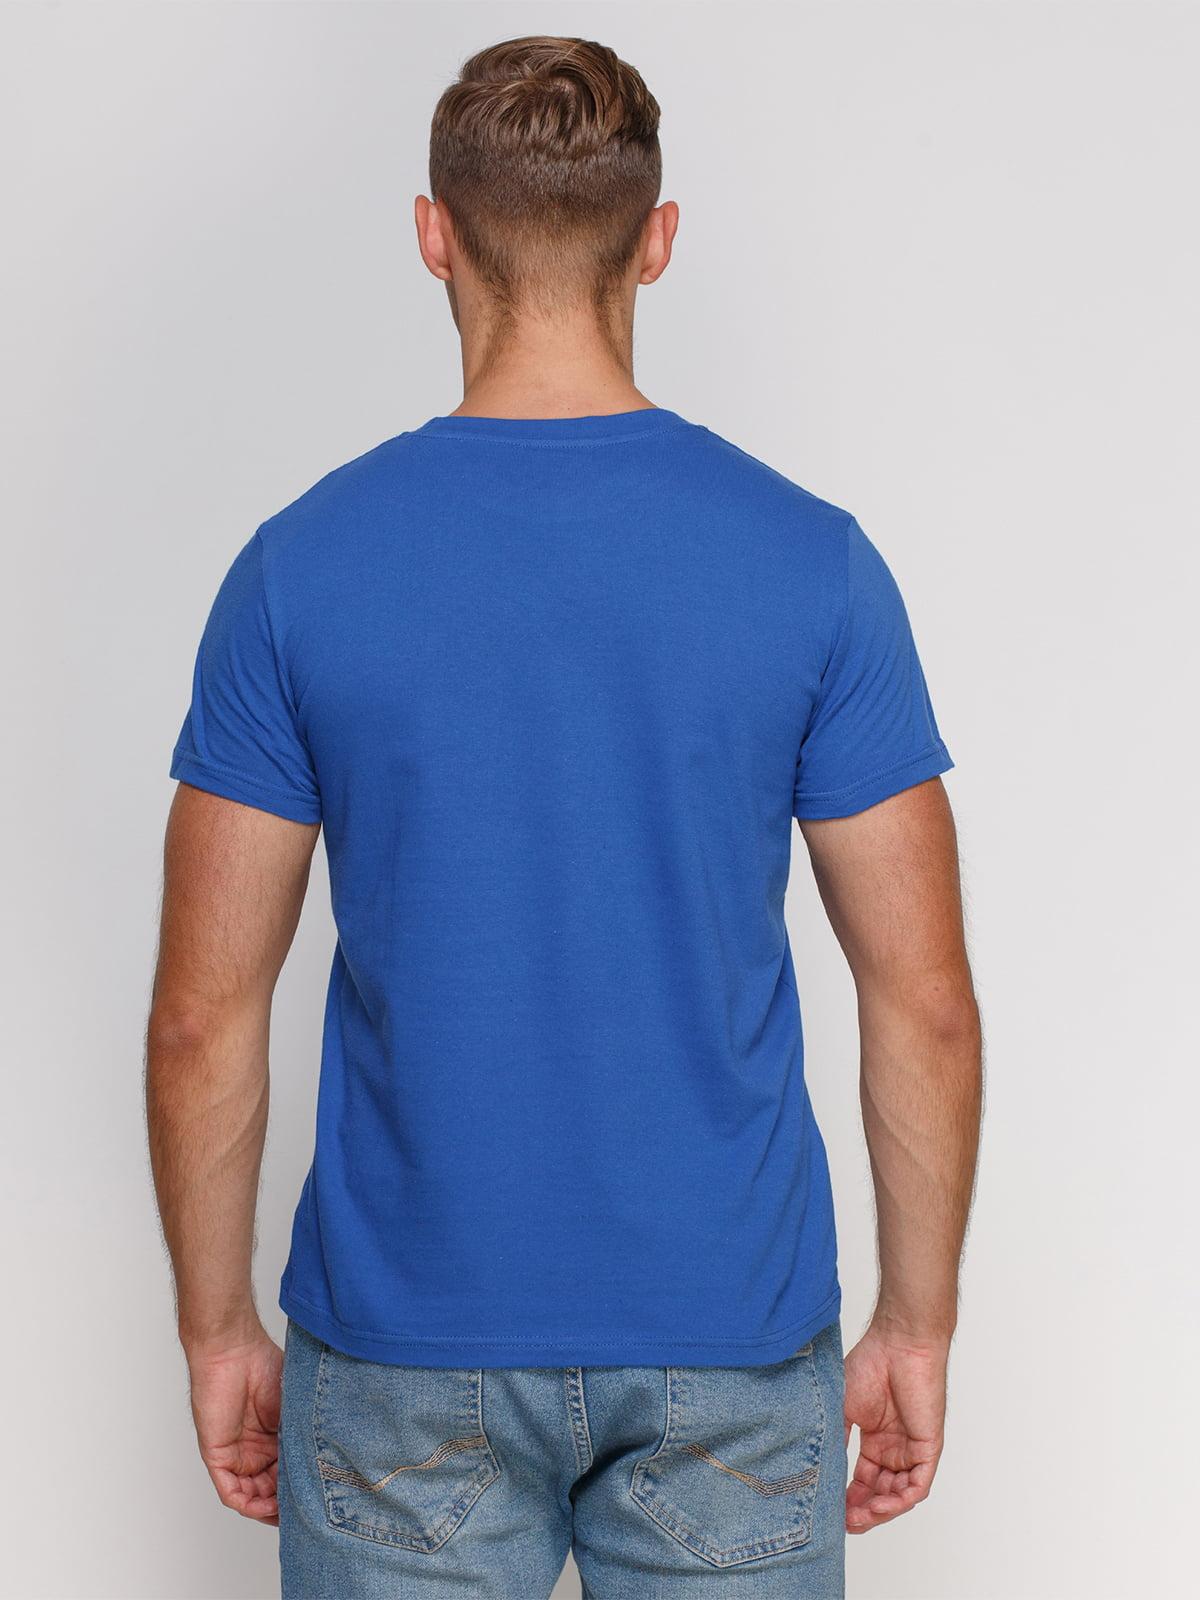 Футболка синя з принтом | 4578525 | фото 2